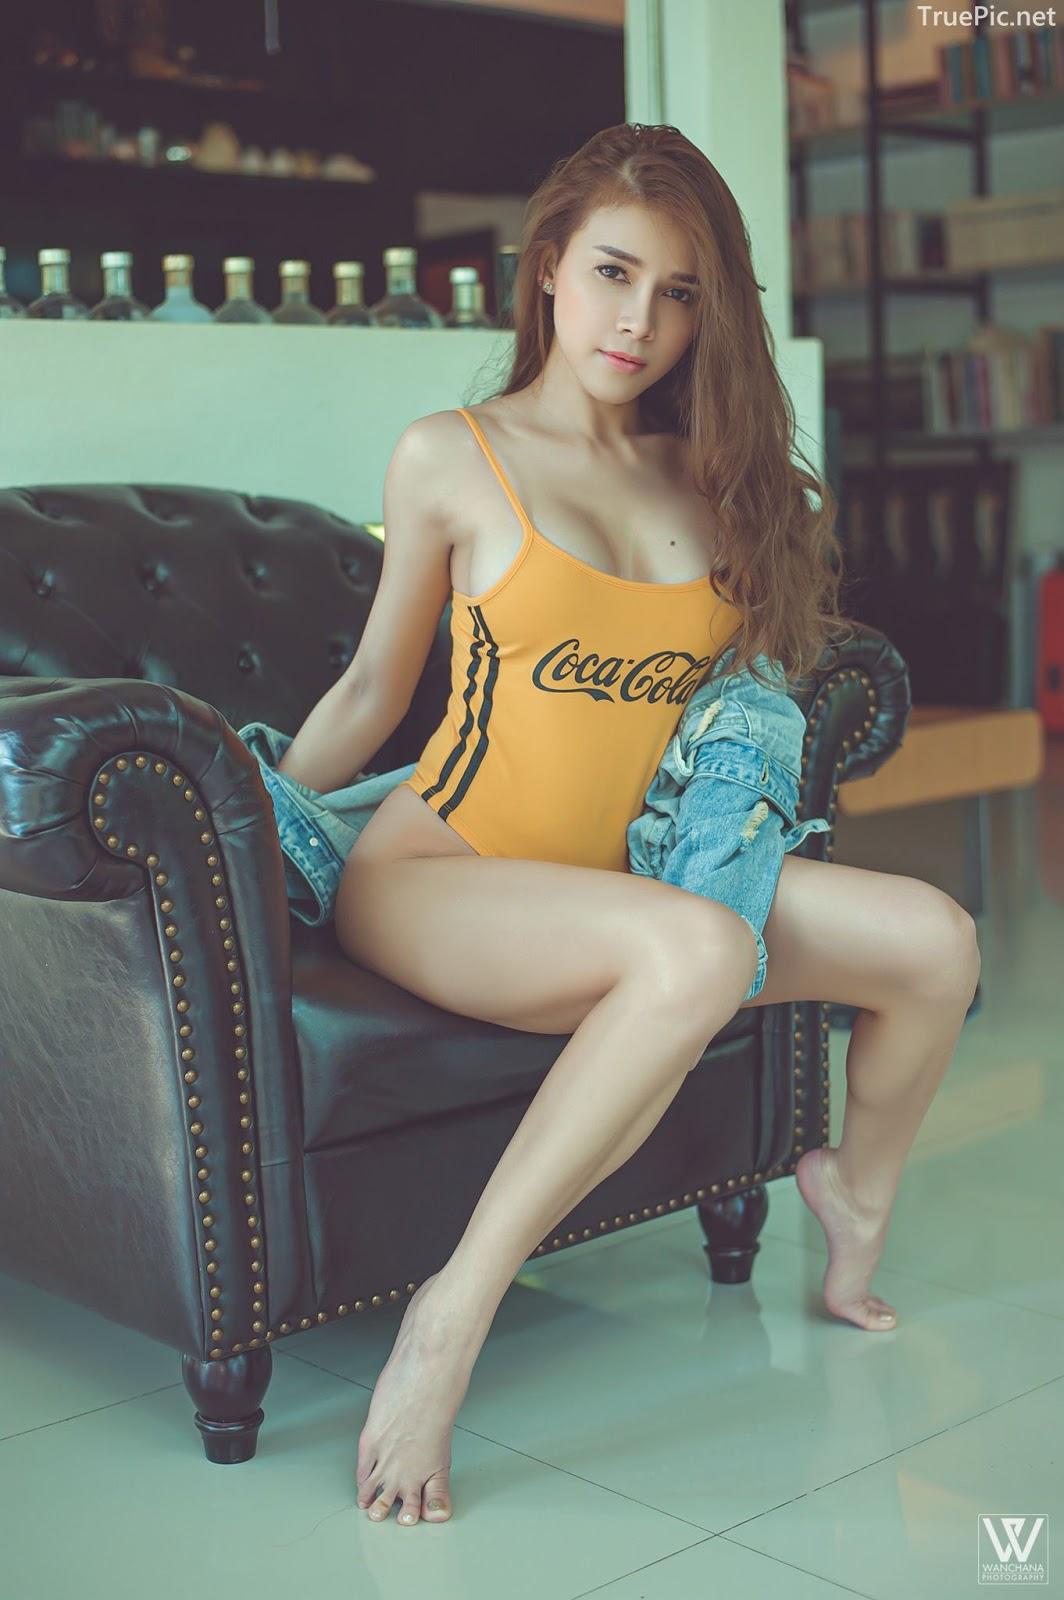 Thailand Sexy Model - Lanchakorn Yeunyaw - Yellow Coca Colas - TruePic.net - Picture 7